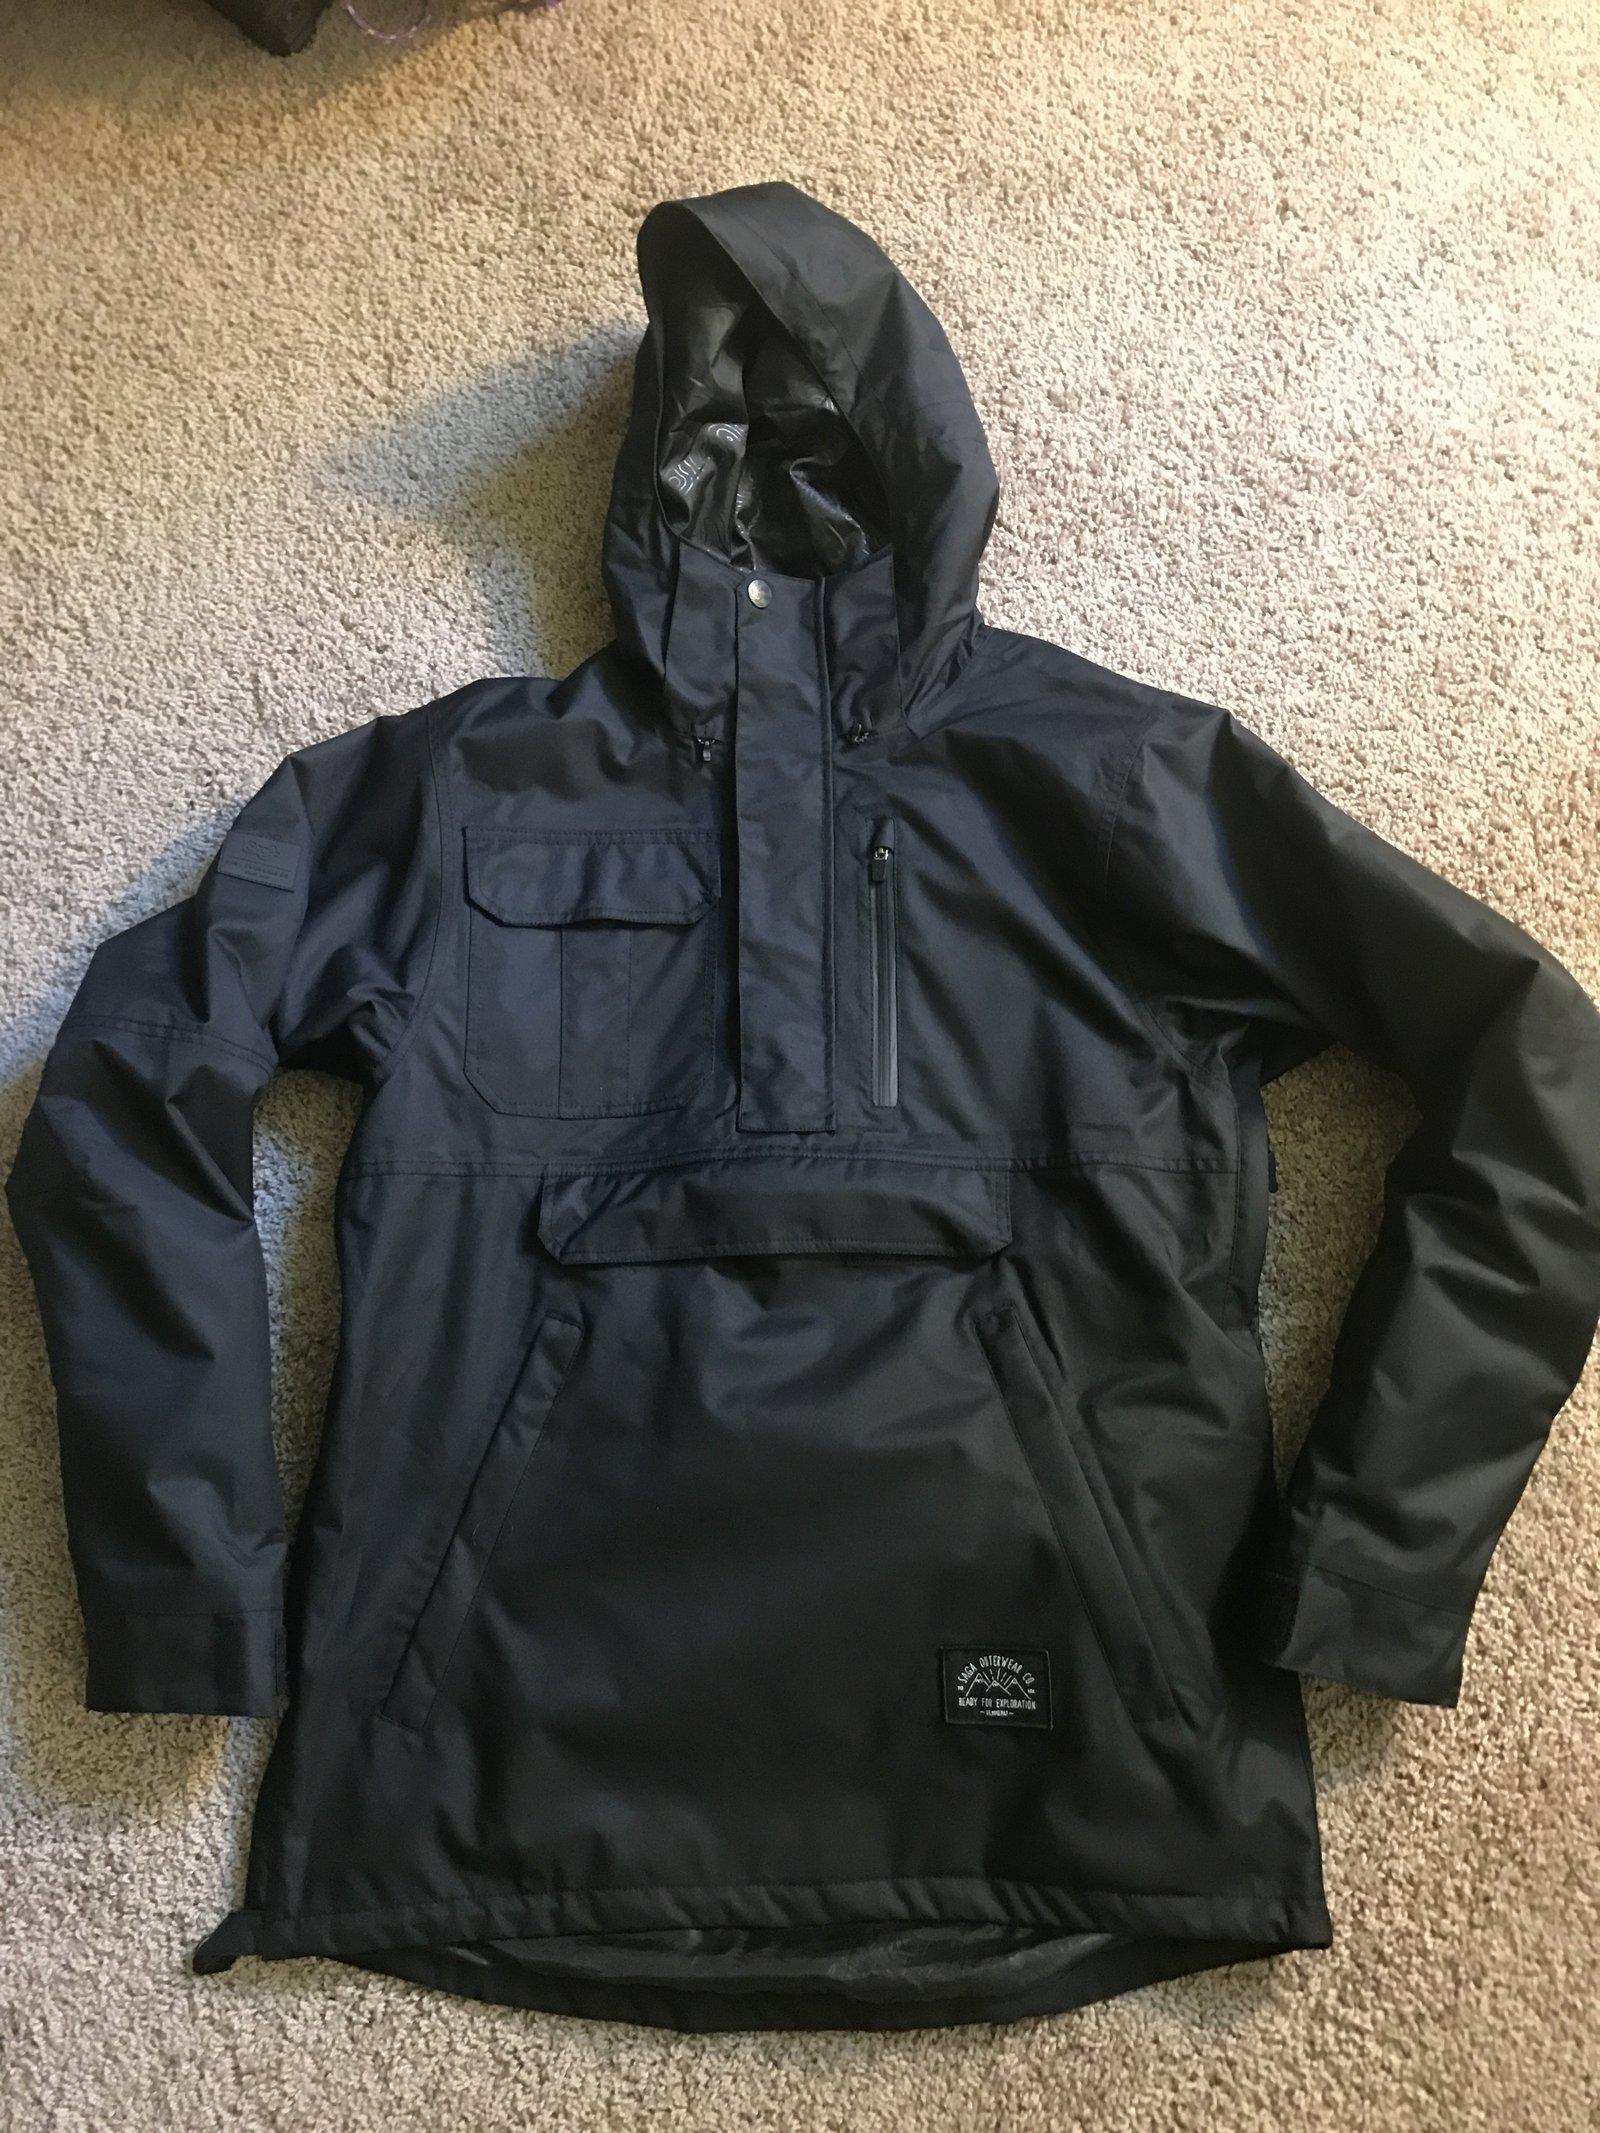 For Sale: Like New Saga Anomie jacket-L